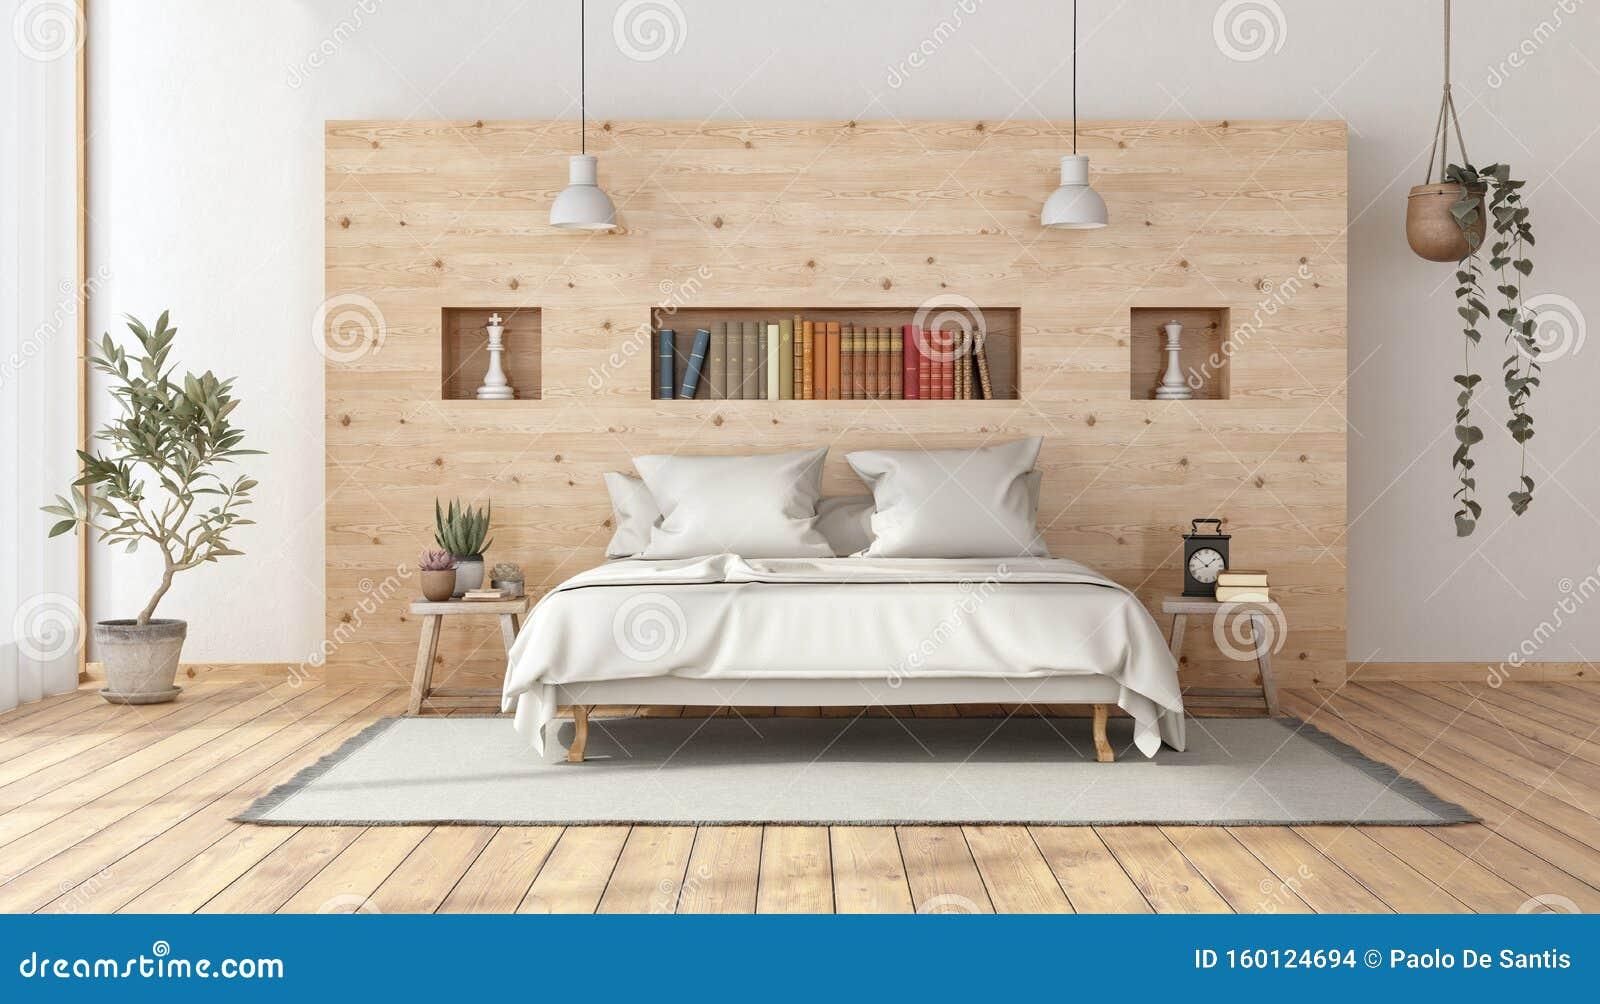 Master Bedroom In Rustic Style Stock Illustration Illustration Of Room Minimalist 160124694